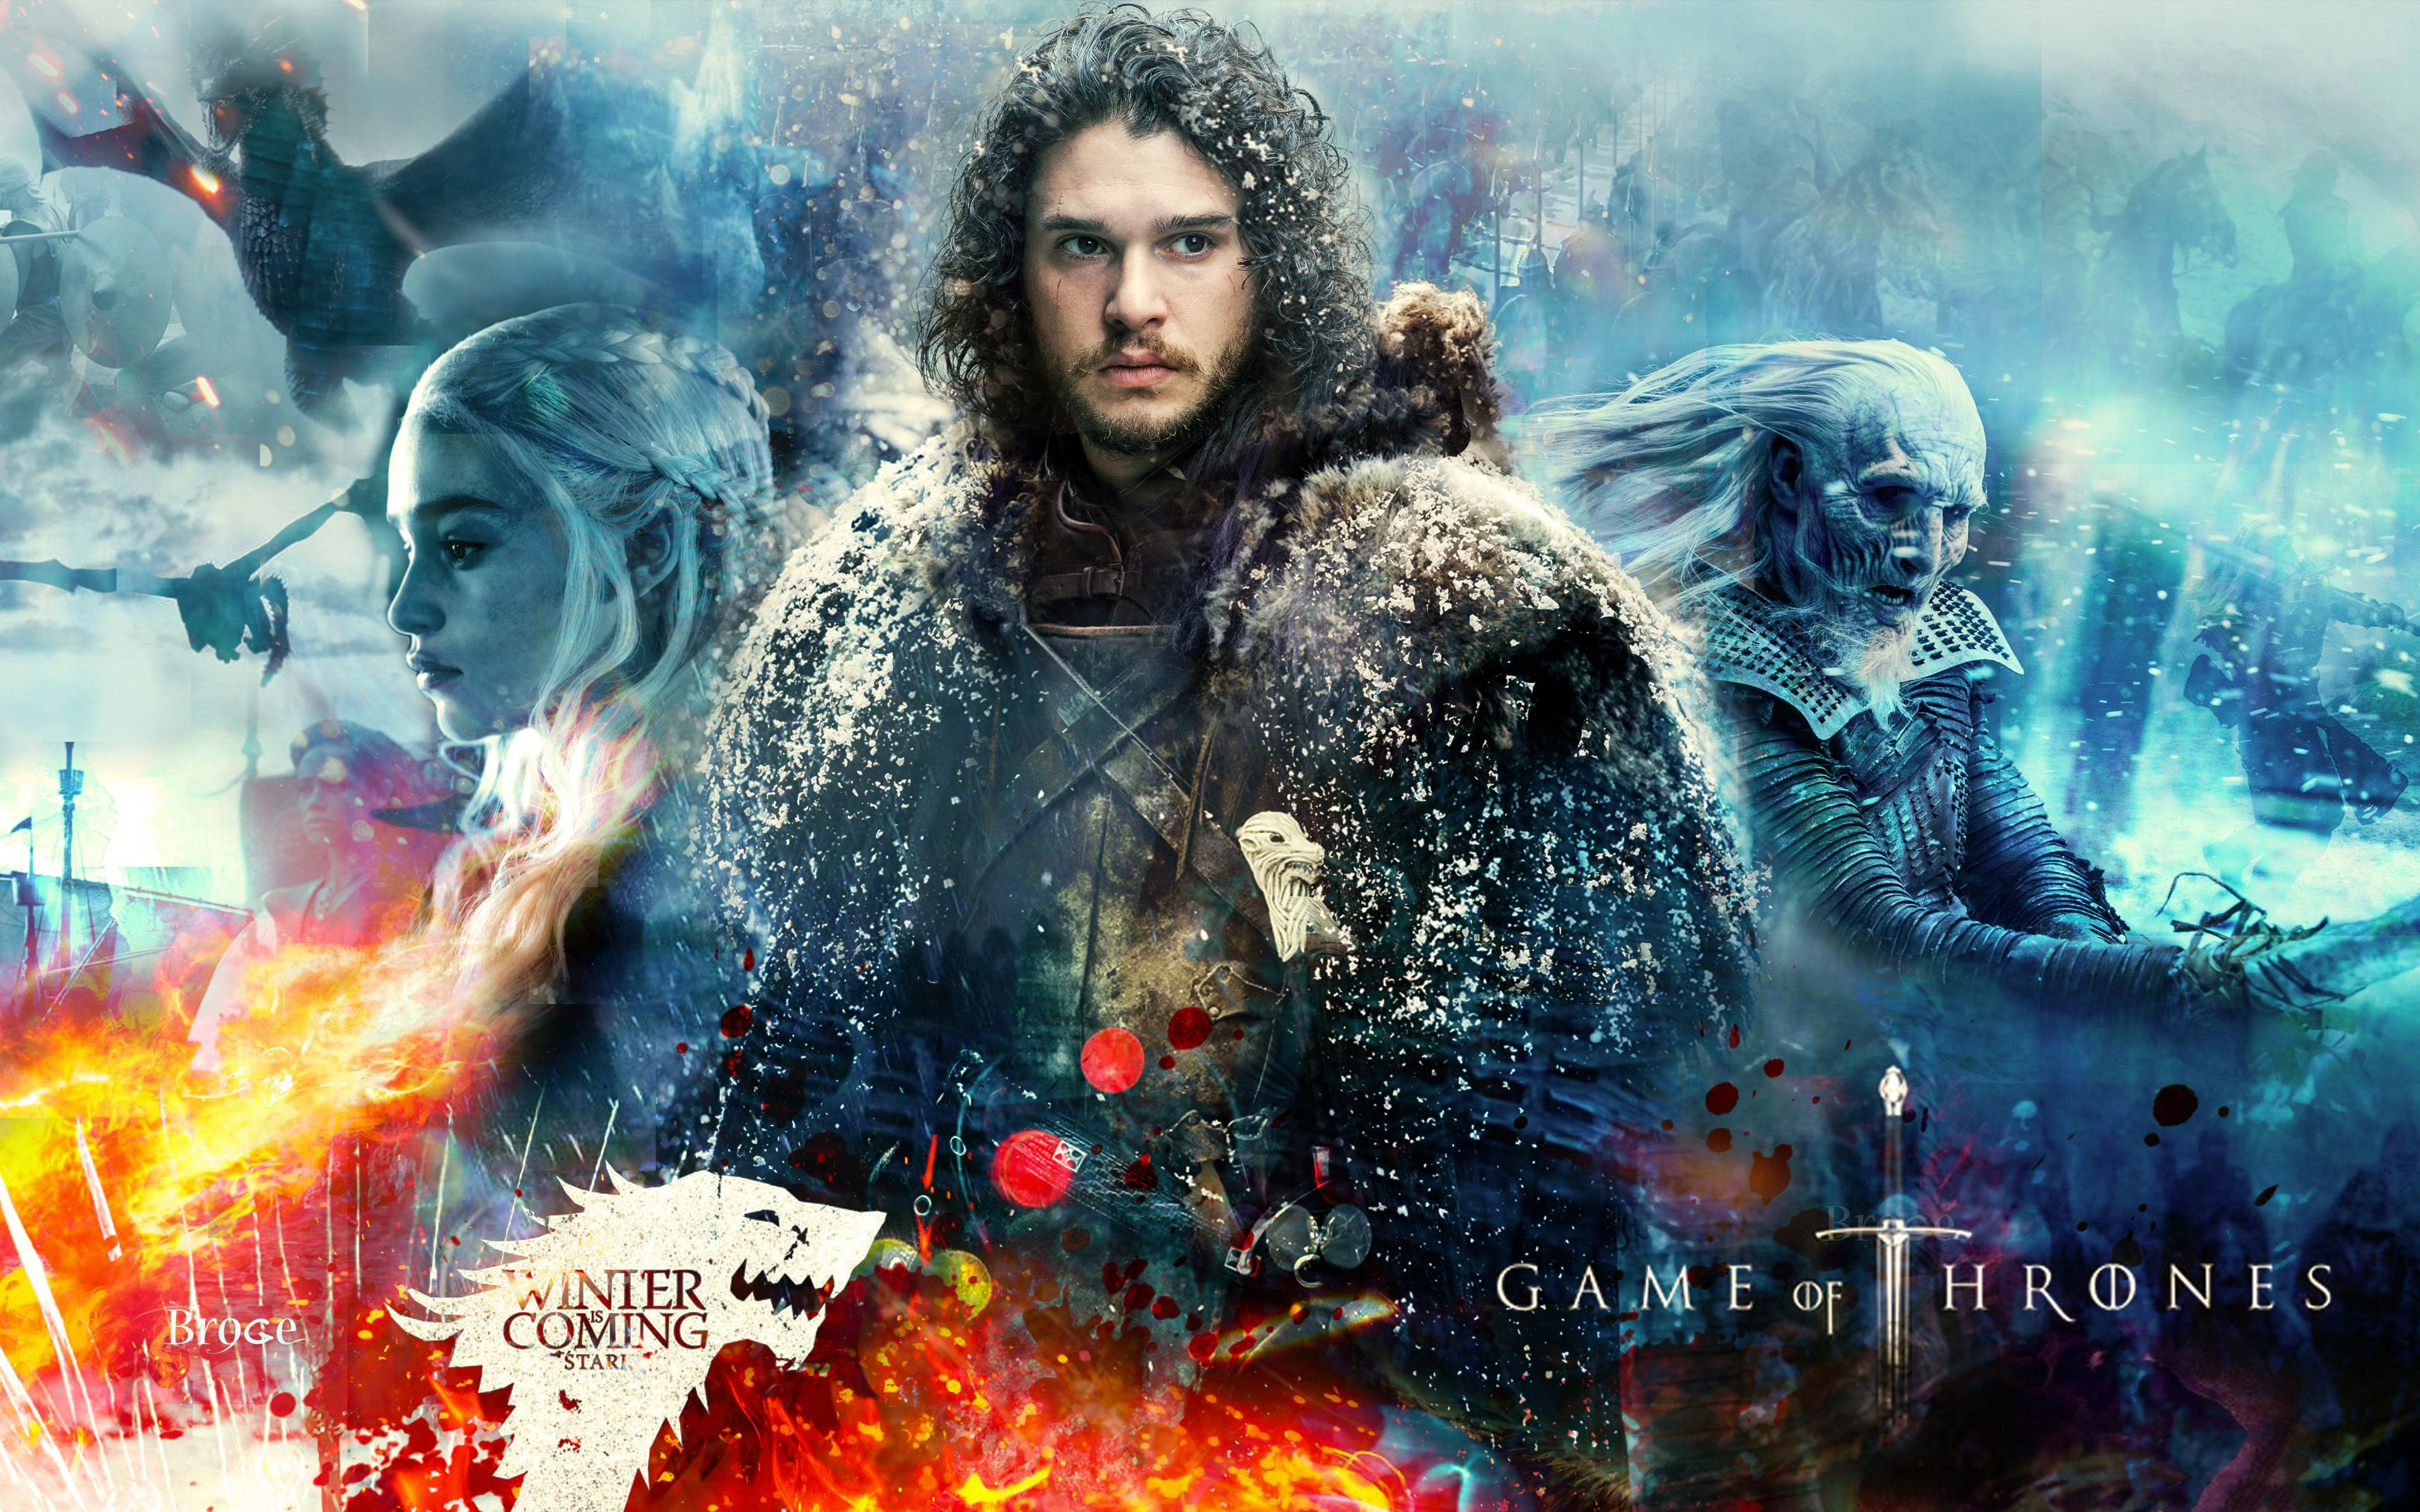 Jon Snow Game Of Thrones Wallpapers Top Free Jon Snow Game Of